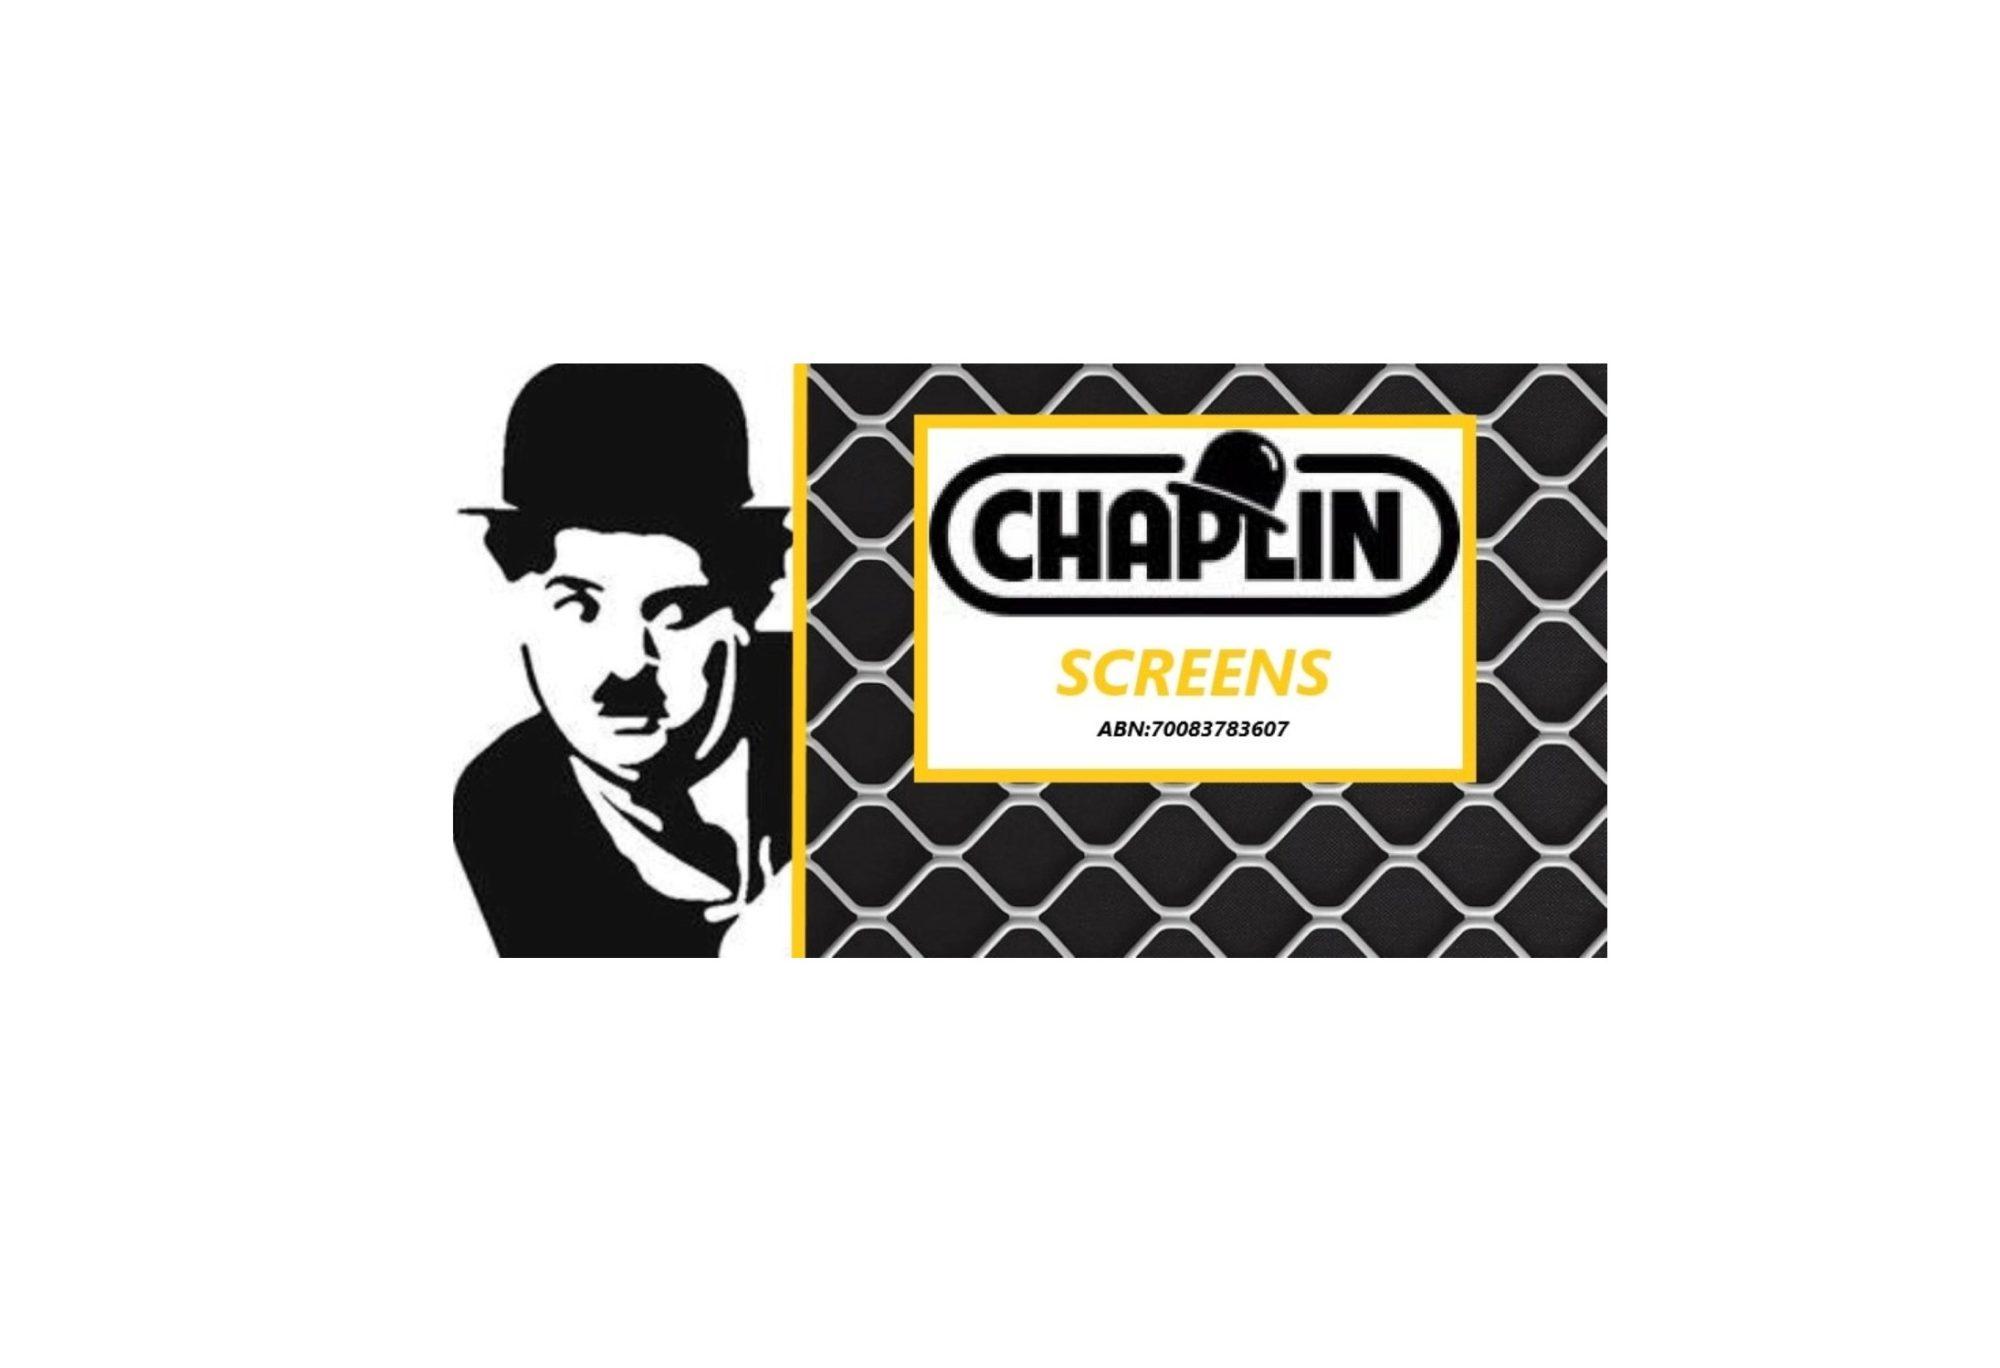 Chaplin Screens